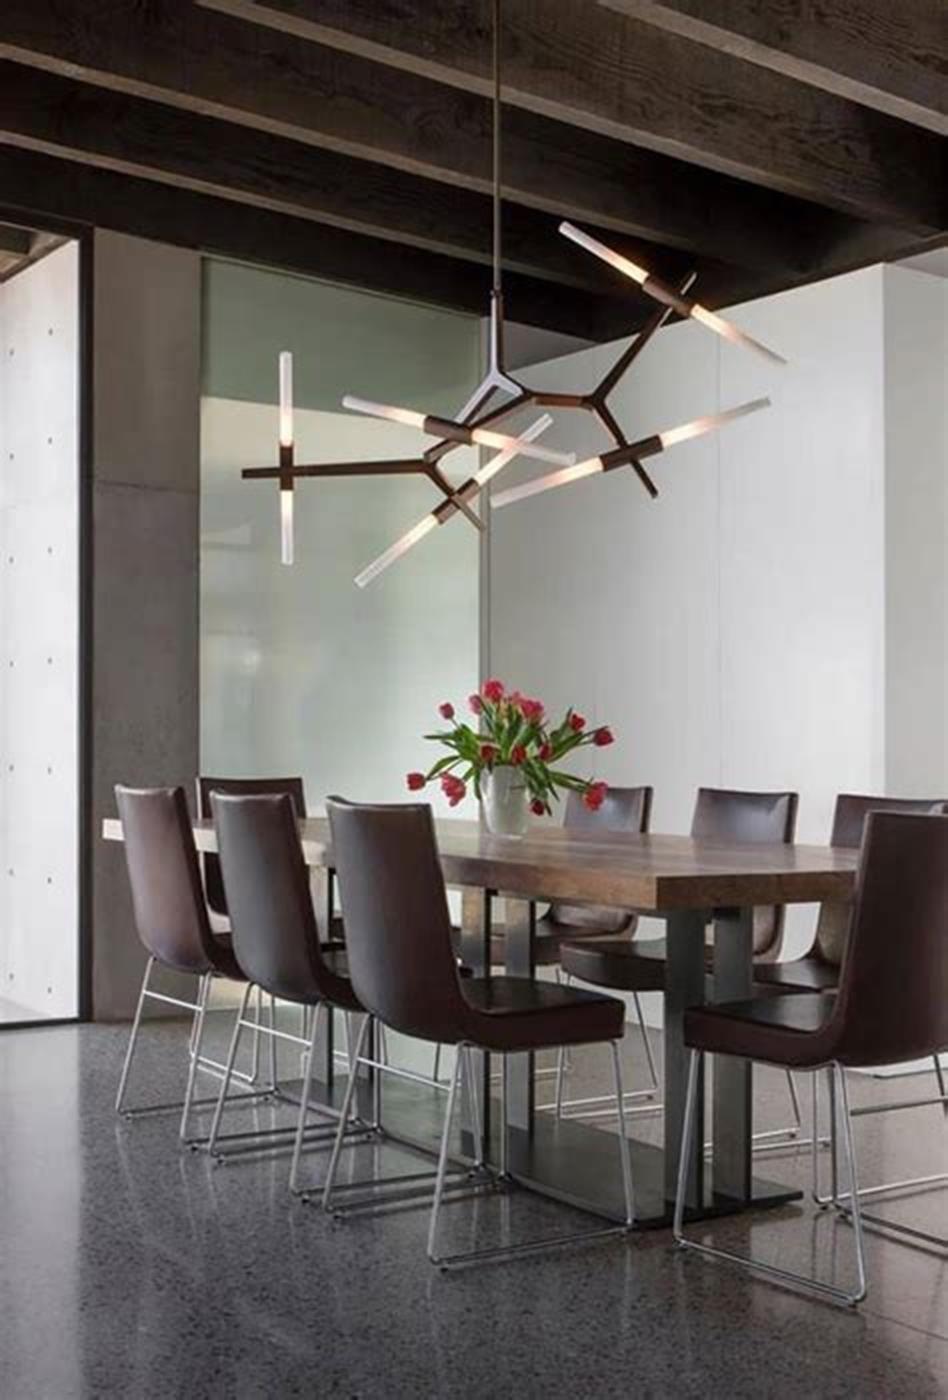 45 Best Modern Chandelier Dining Room Ideas For 2019 36 Decorecent 45 Best Mo In 2020 Dining Room Chandelier Modern Modern Chandelier Dining Dining Room Decor Modern